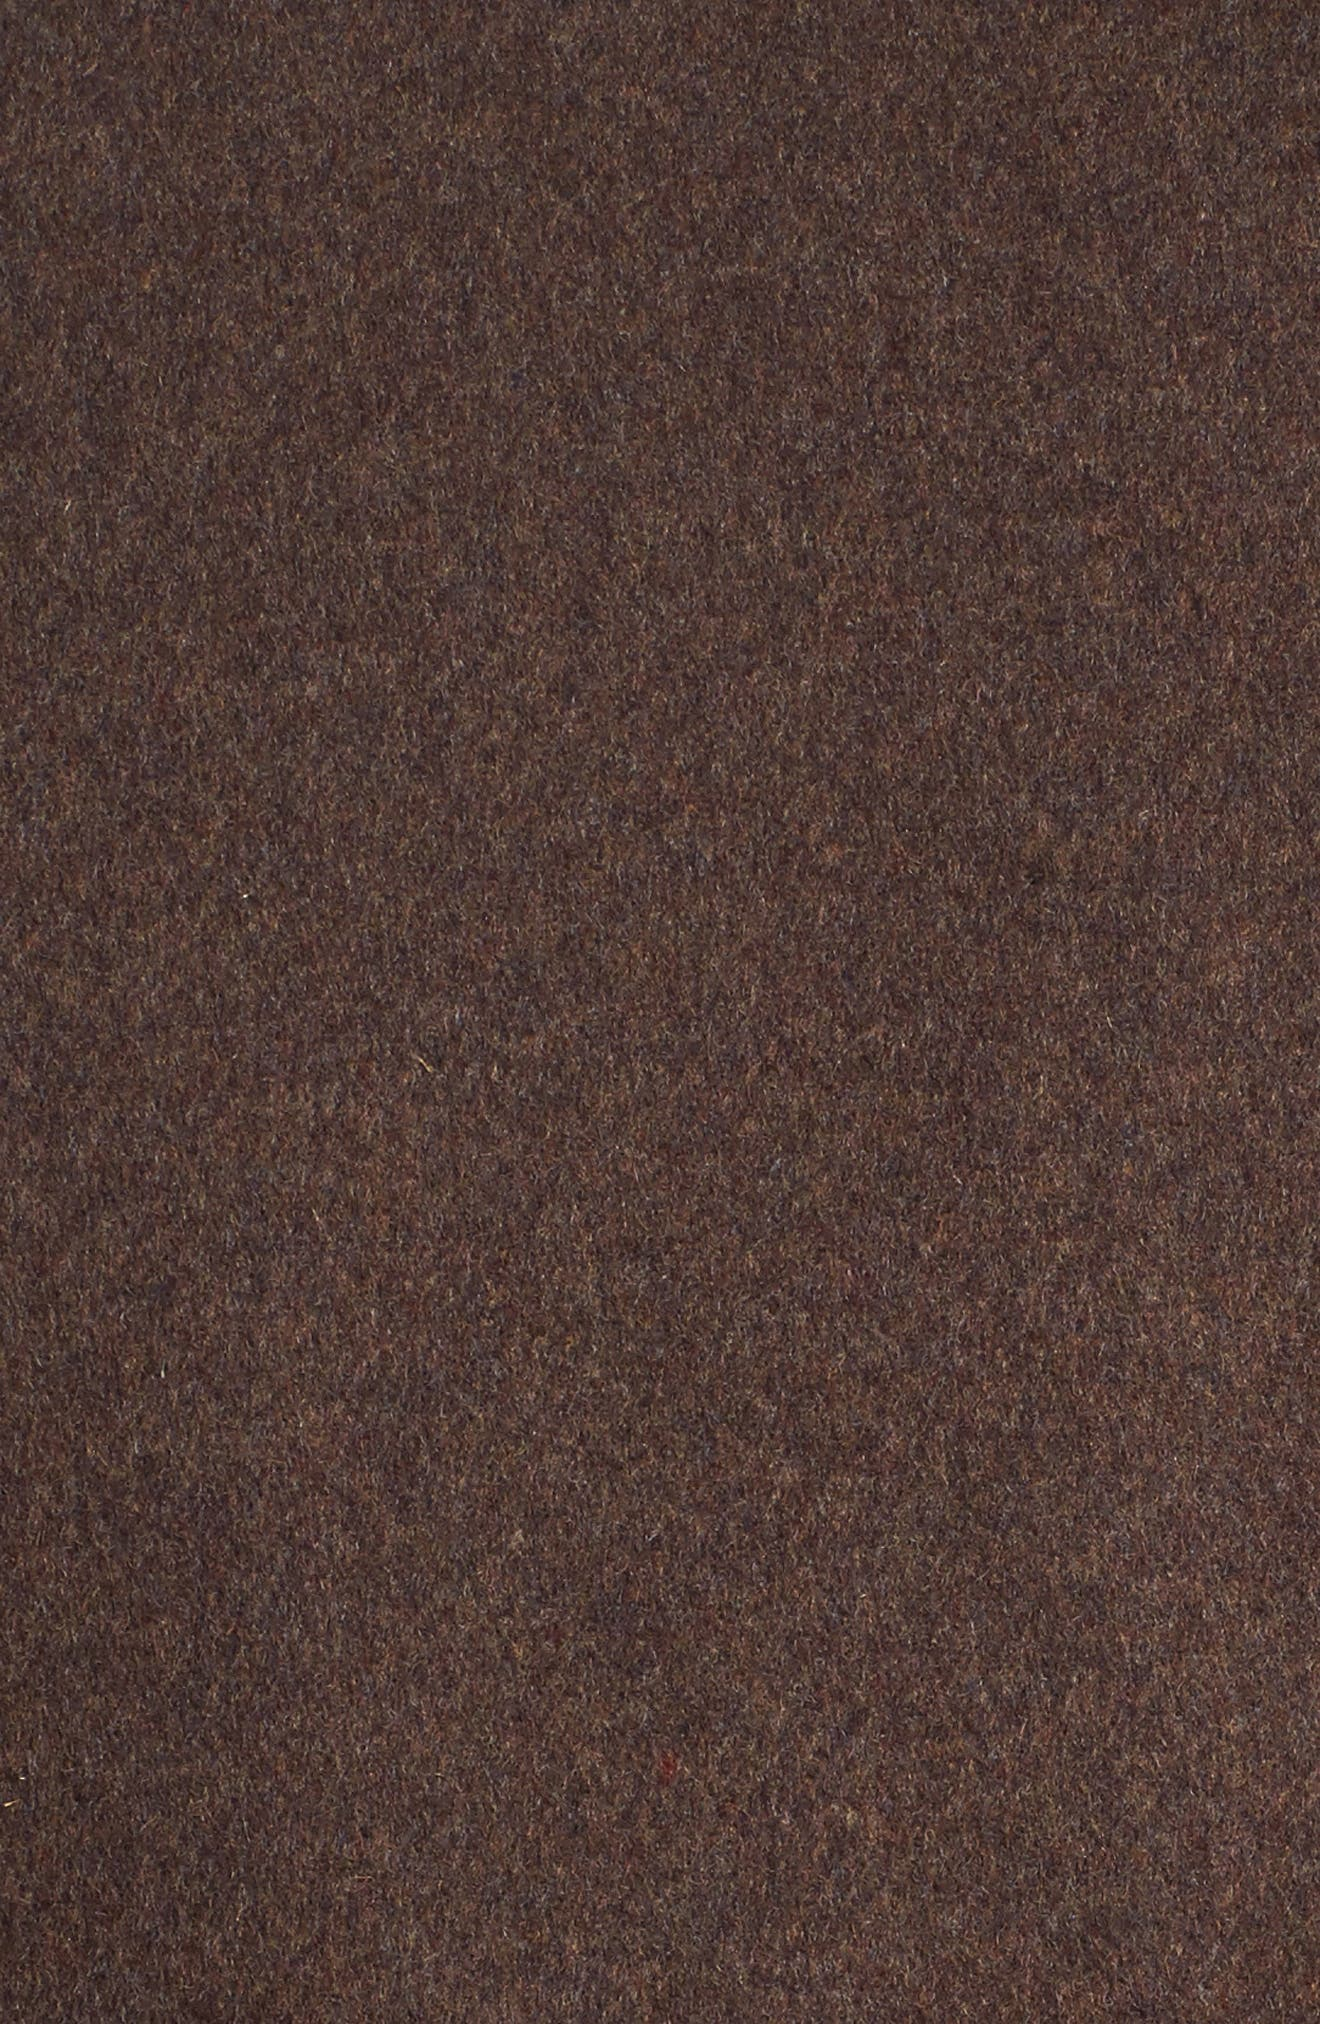 Wool Blend Peacoat,                             Alternate thumbnail 5, color,                             Medium Brown